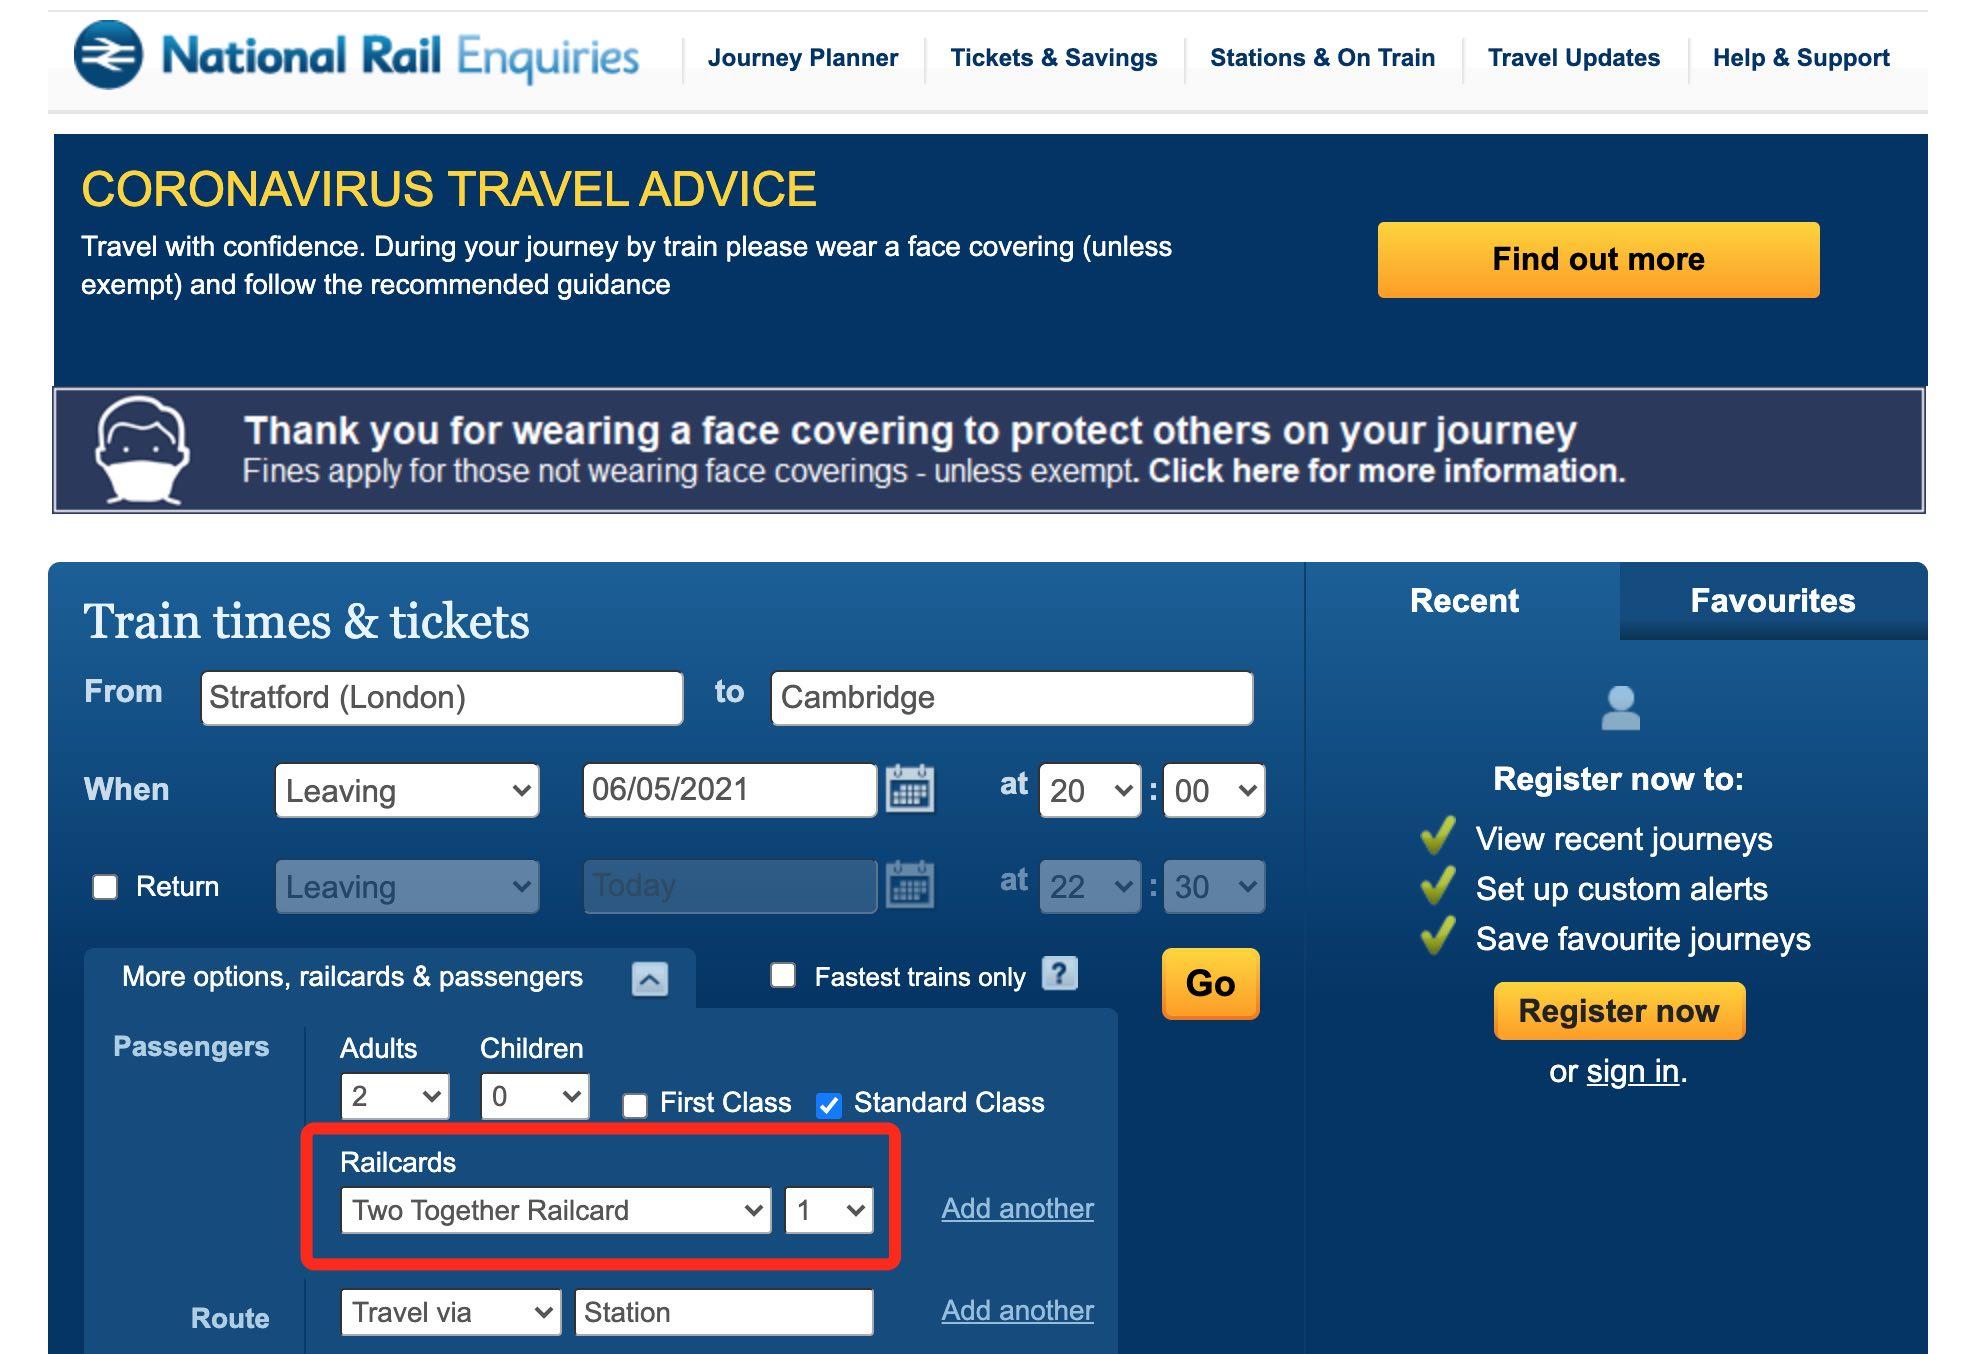 如何在英國國鐵買票時加註Two Together Railcard